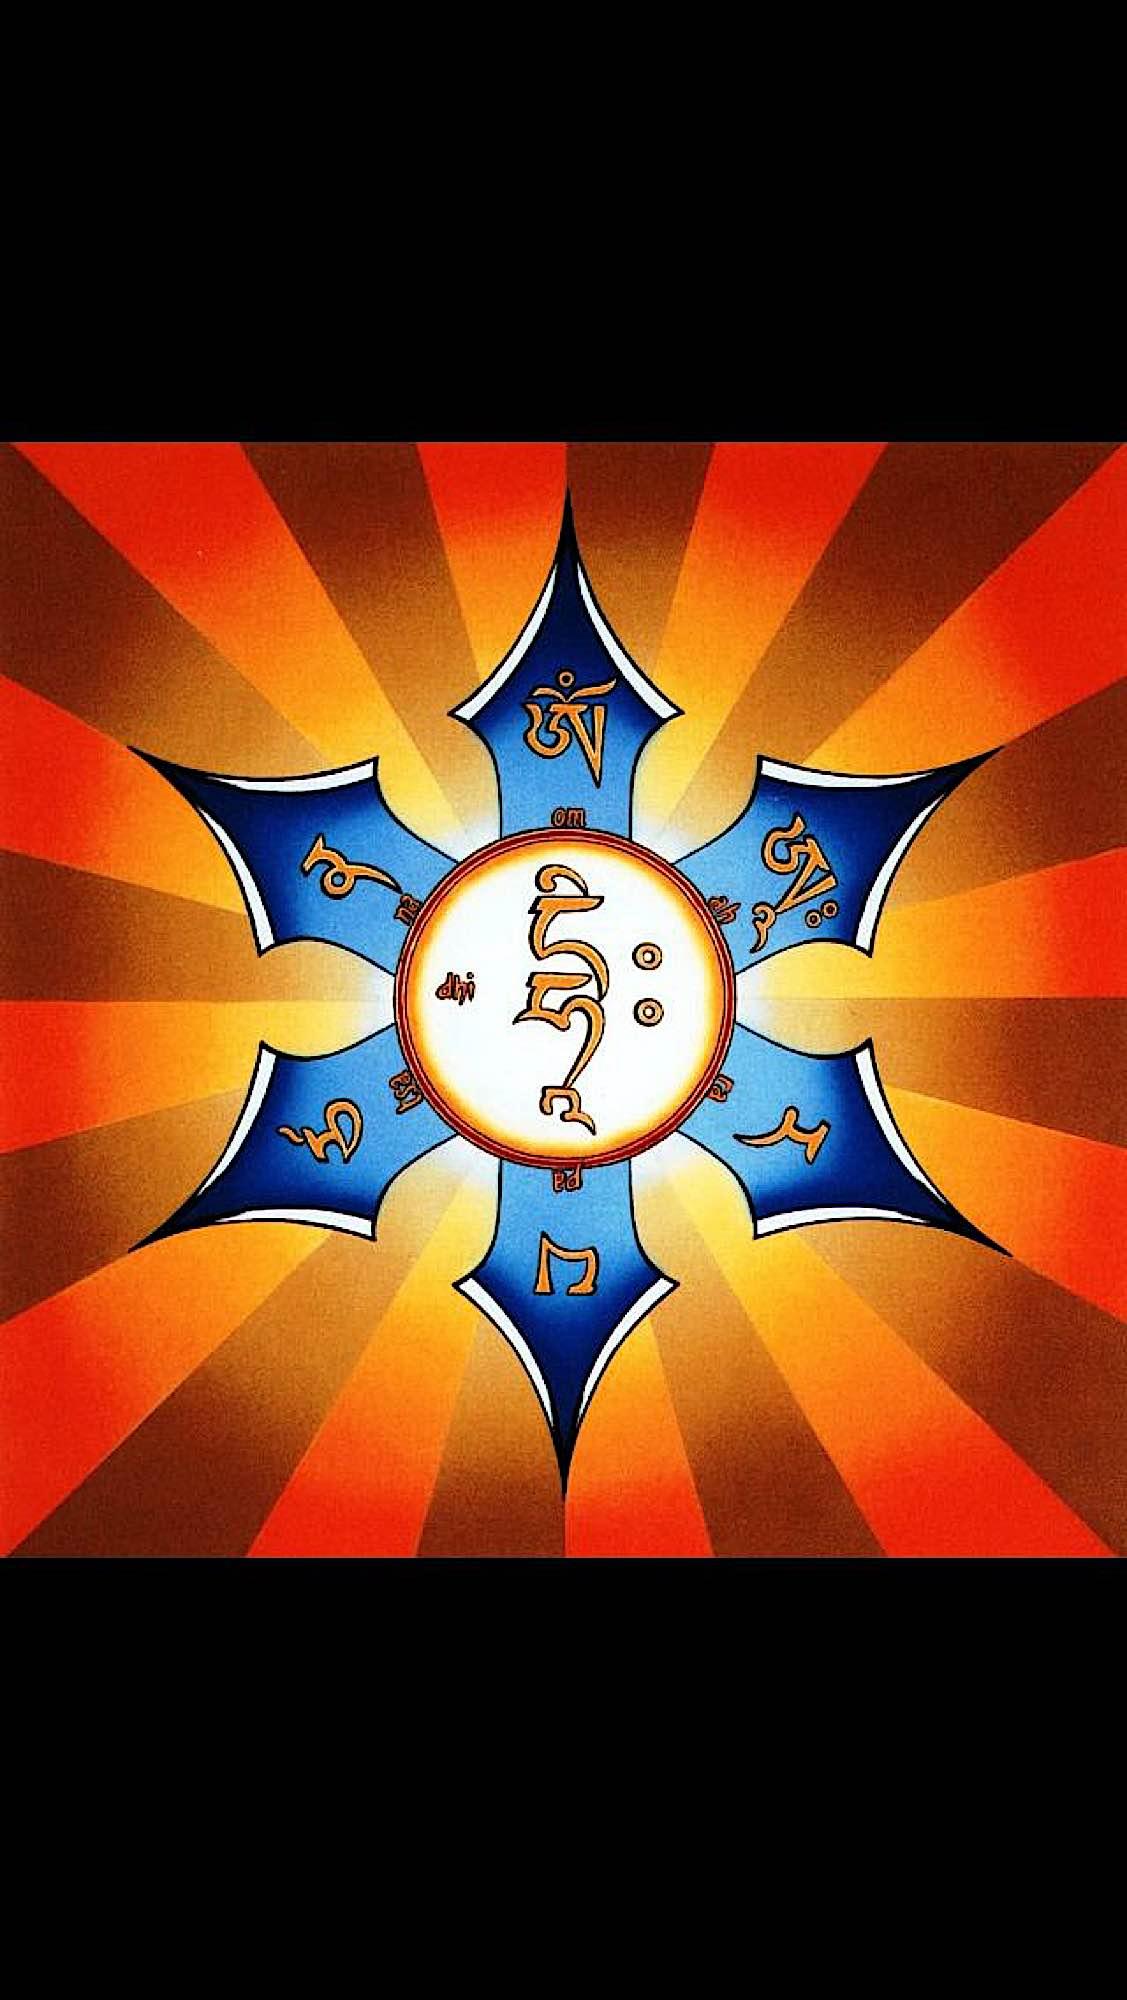 Buddha Weekly MANJUSHRI Mantra Arapachana Buddhism